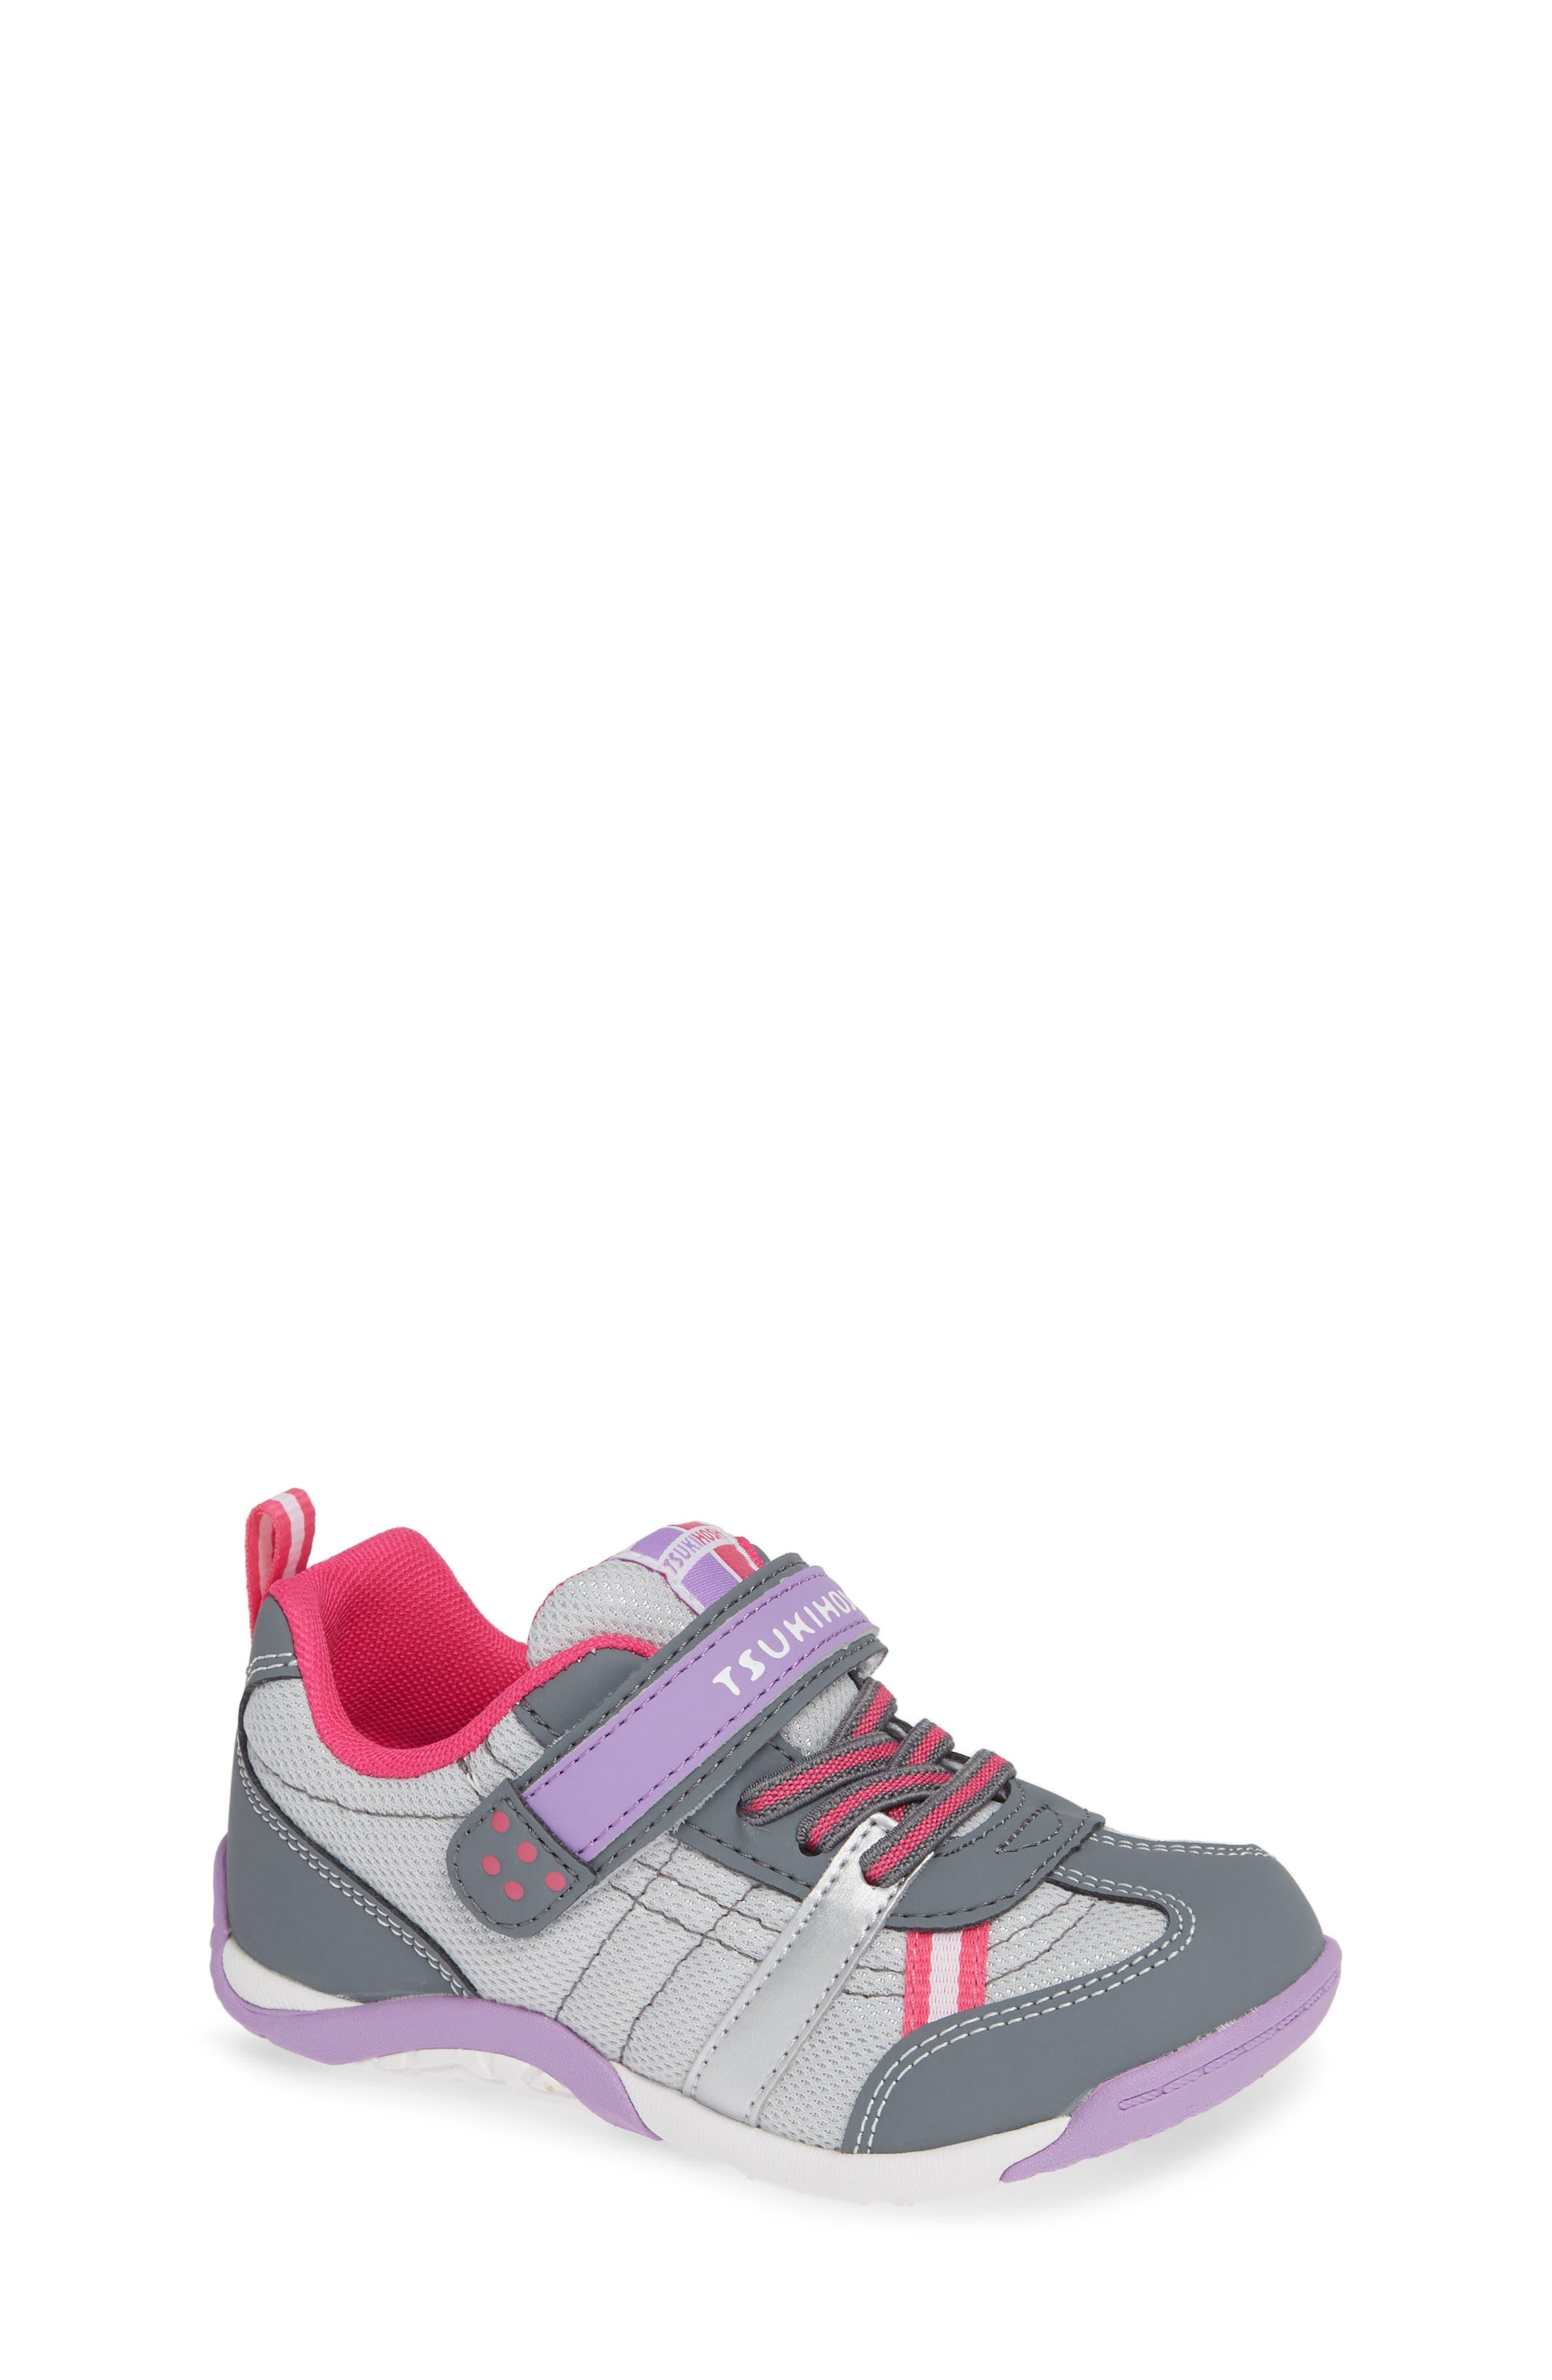 Kaz Washable Sneaker,                             Main thumbnail 1, color,                             Gray/ Purple